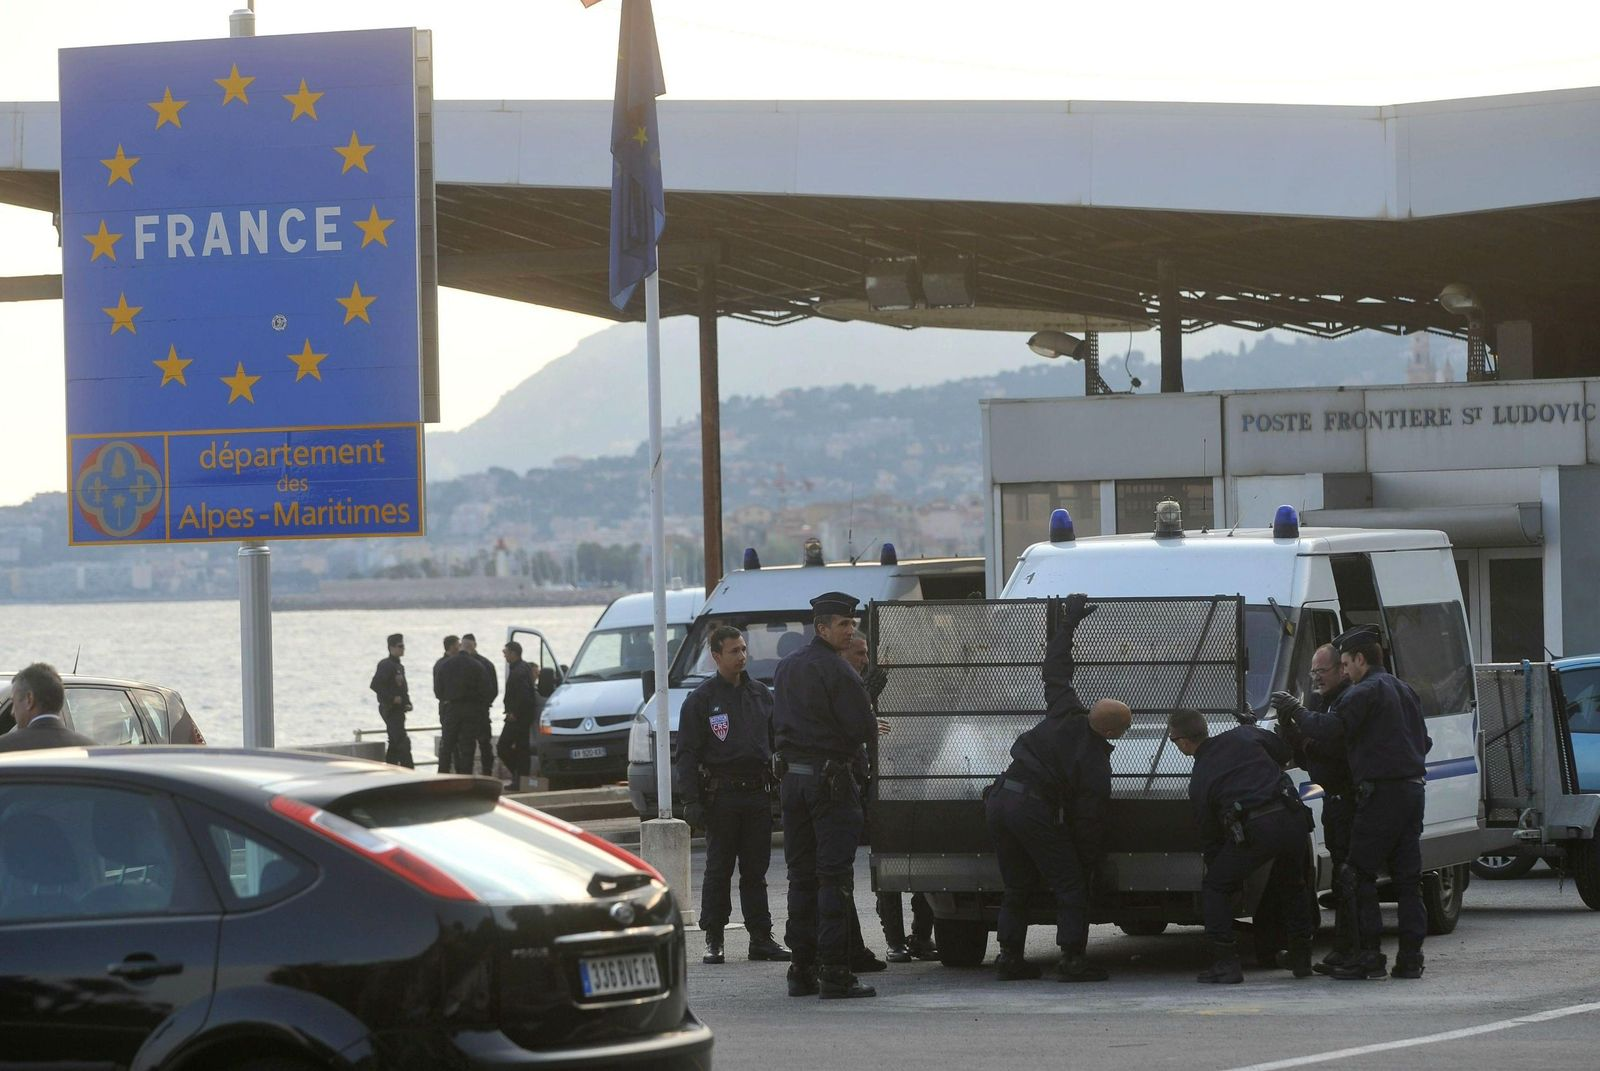 French Police patrols the border point of Ponte San Ludovico, nea